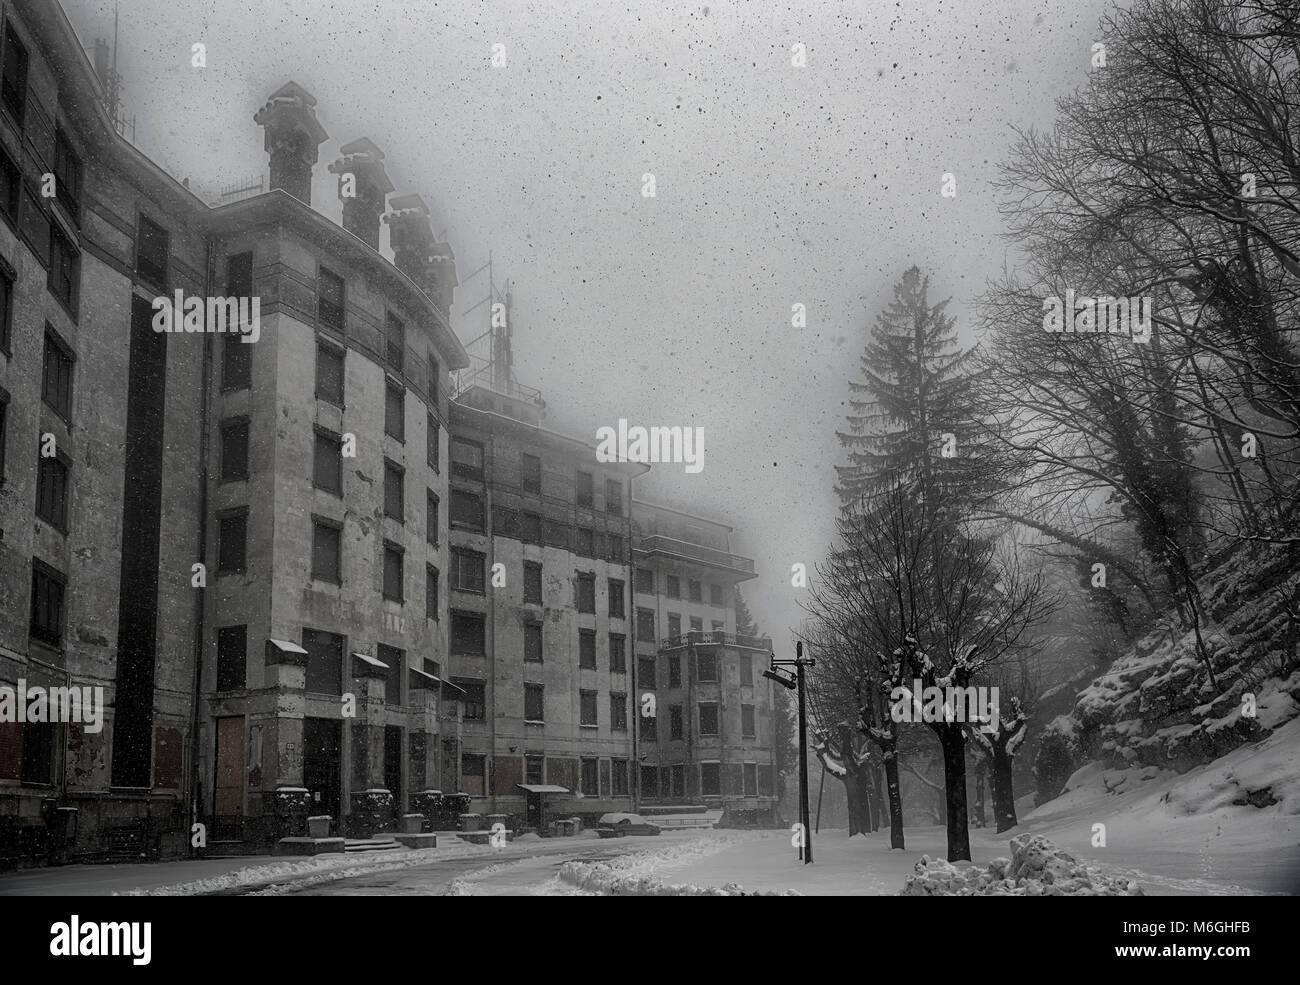 ancient hotel abandoned under a heavy snowfall, Campo dei Fiori Varese - Stock Image